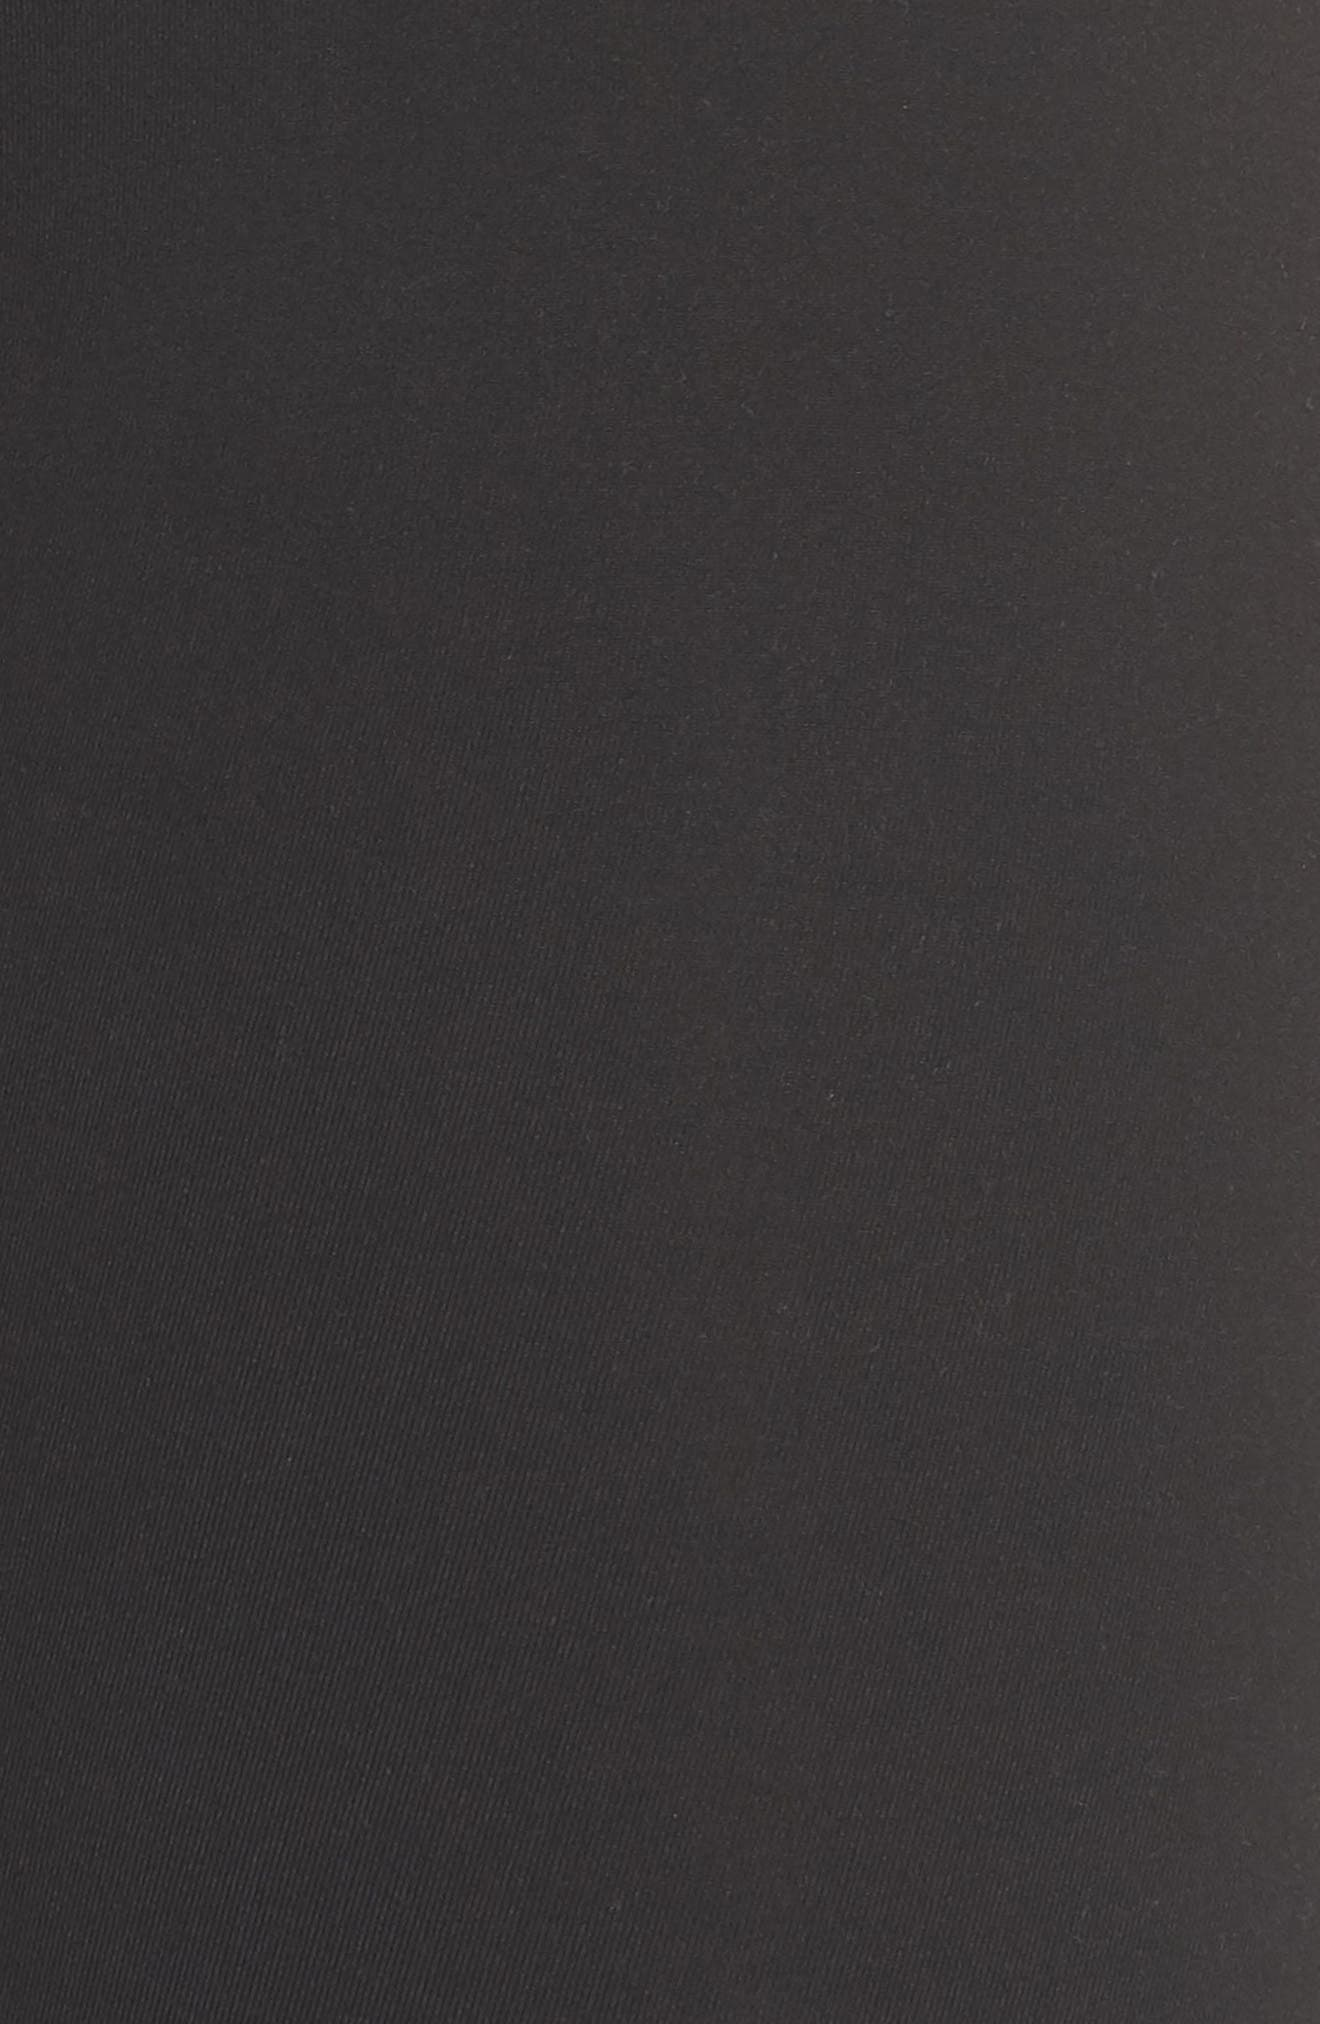 Meditate High Waist Crop Leggings,                             Alternate thumbnail 6, color,                             BLACK